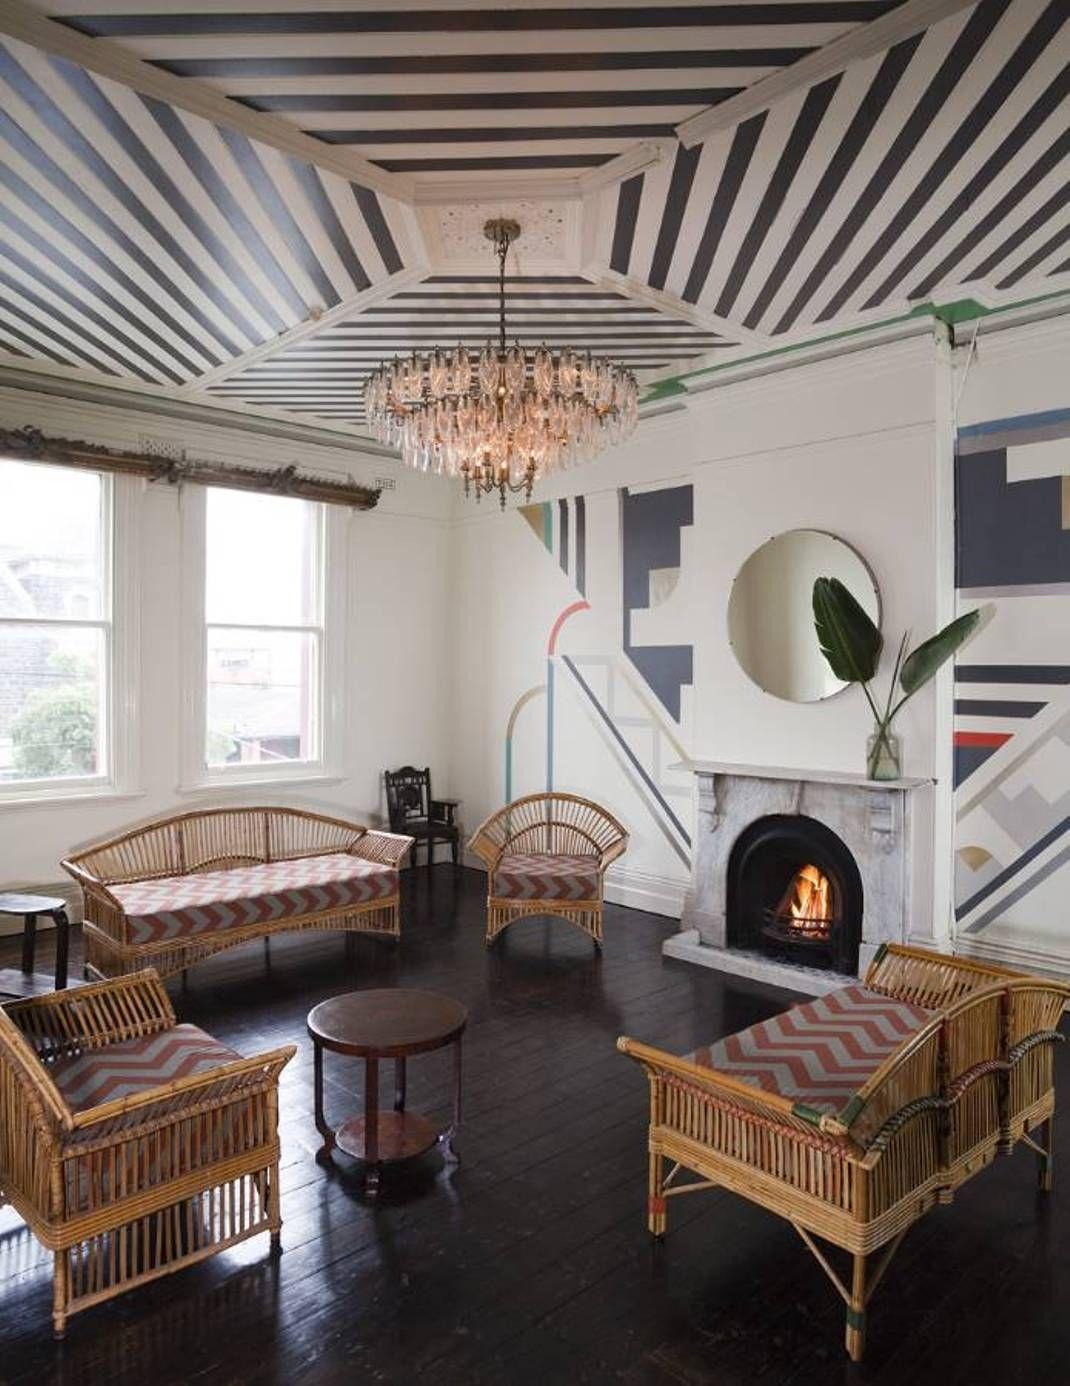 Home Design And Decor Interior Ceiling Ideas Art Deco Living Room With Striped